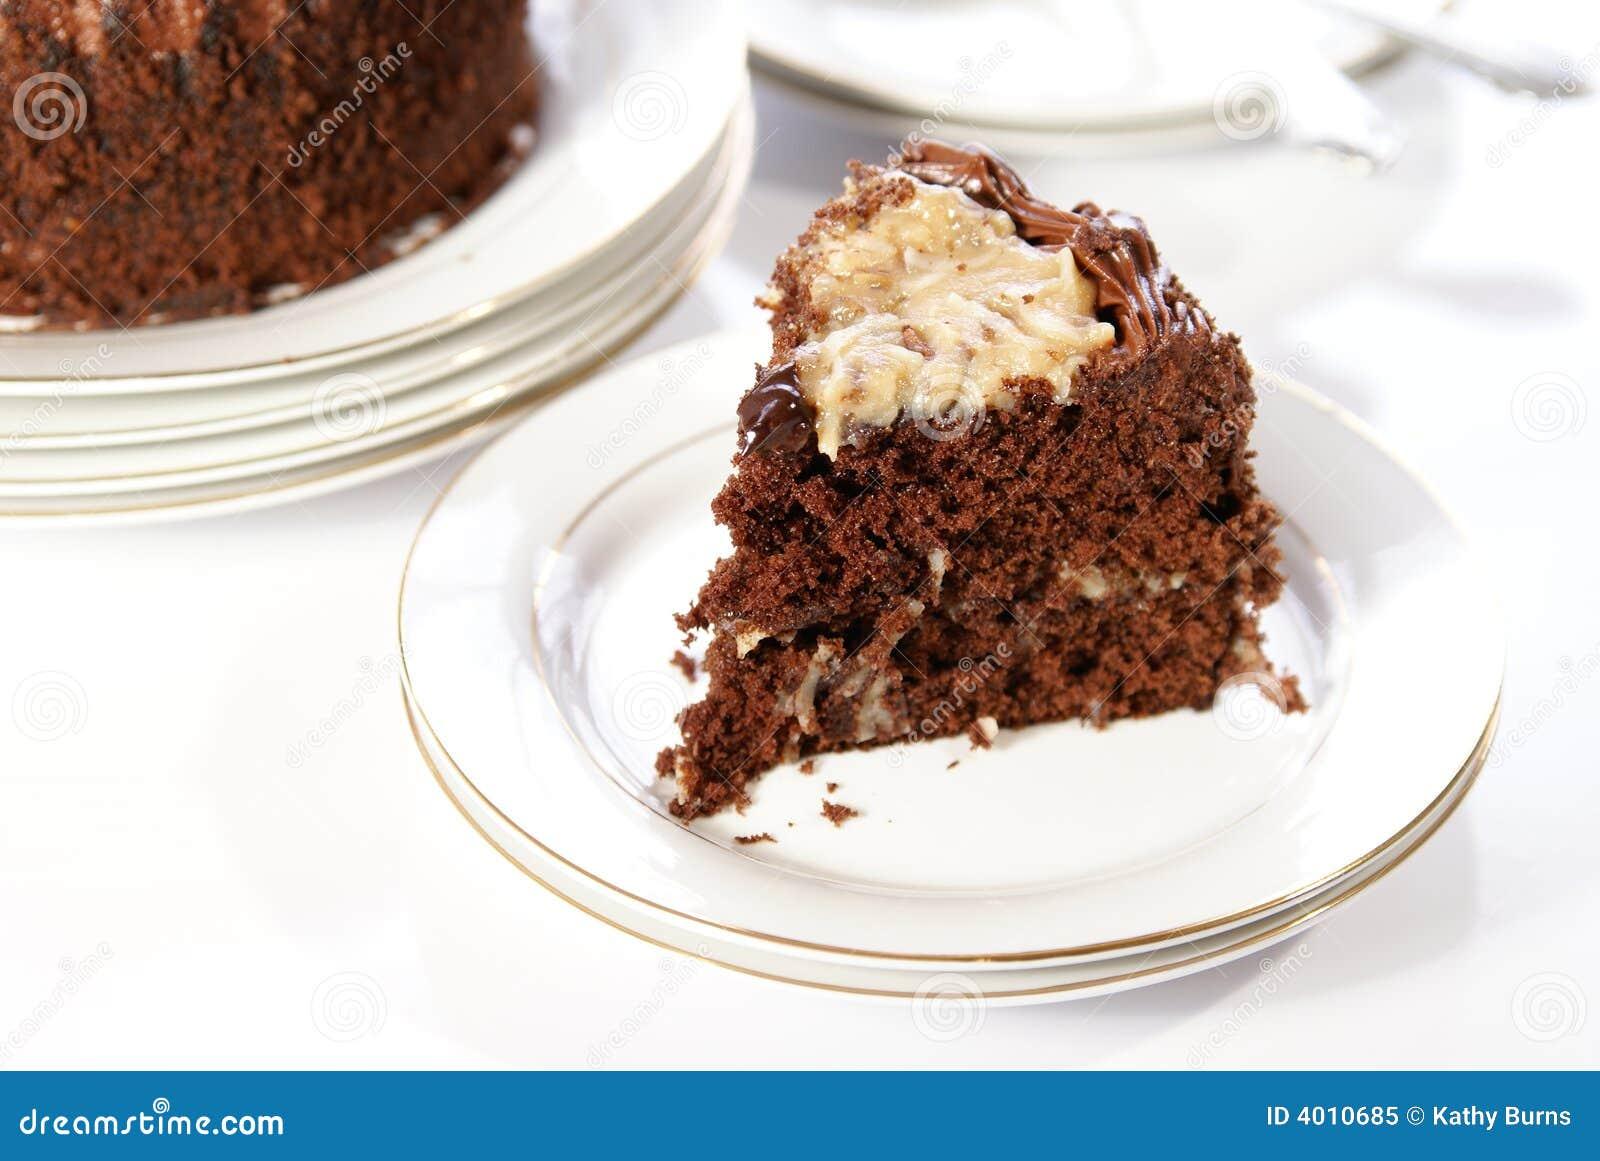 Chocolate Cake Royalty Free Stock Photo - Image: 4010685